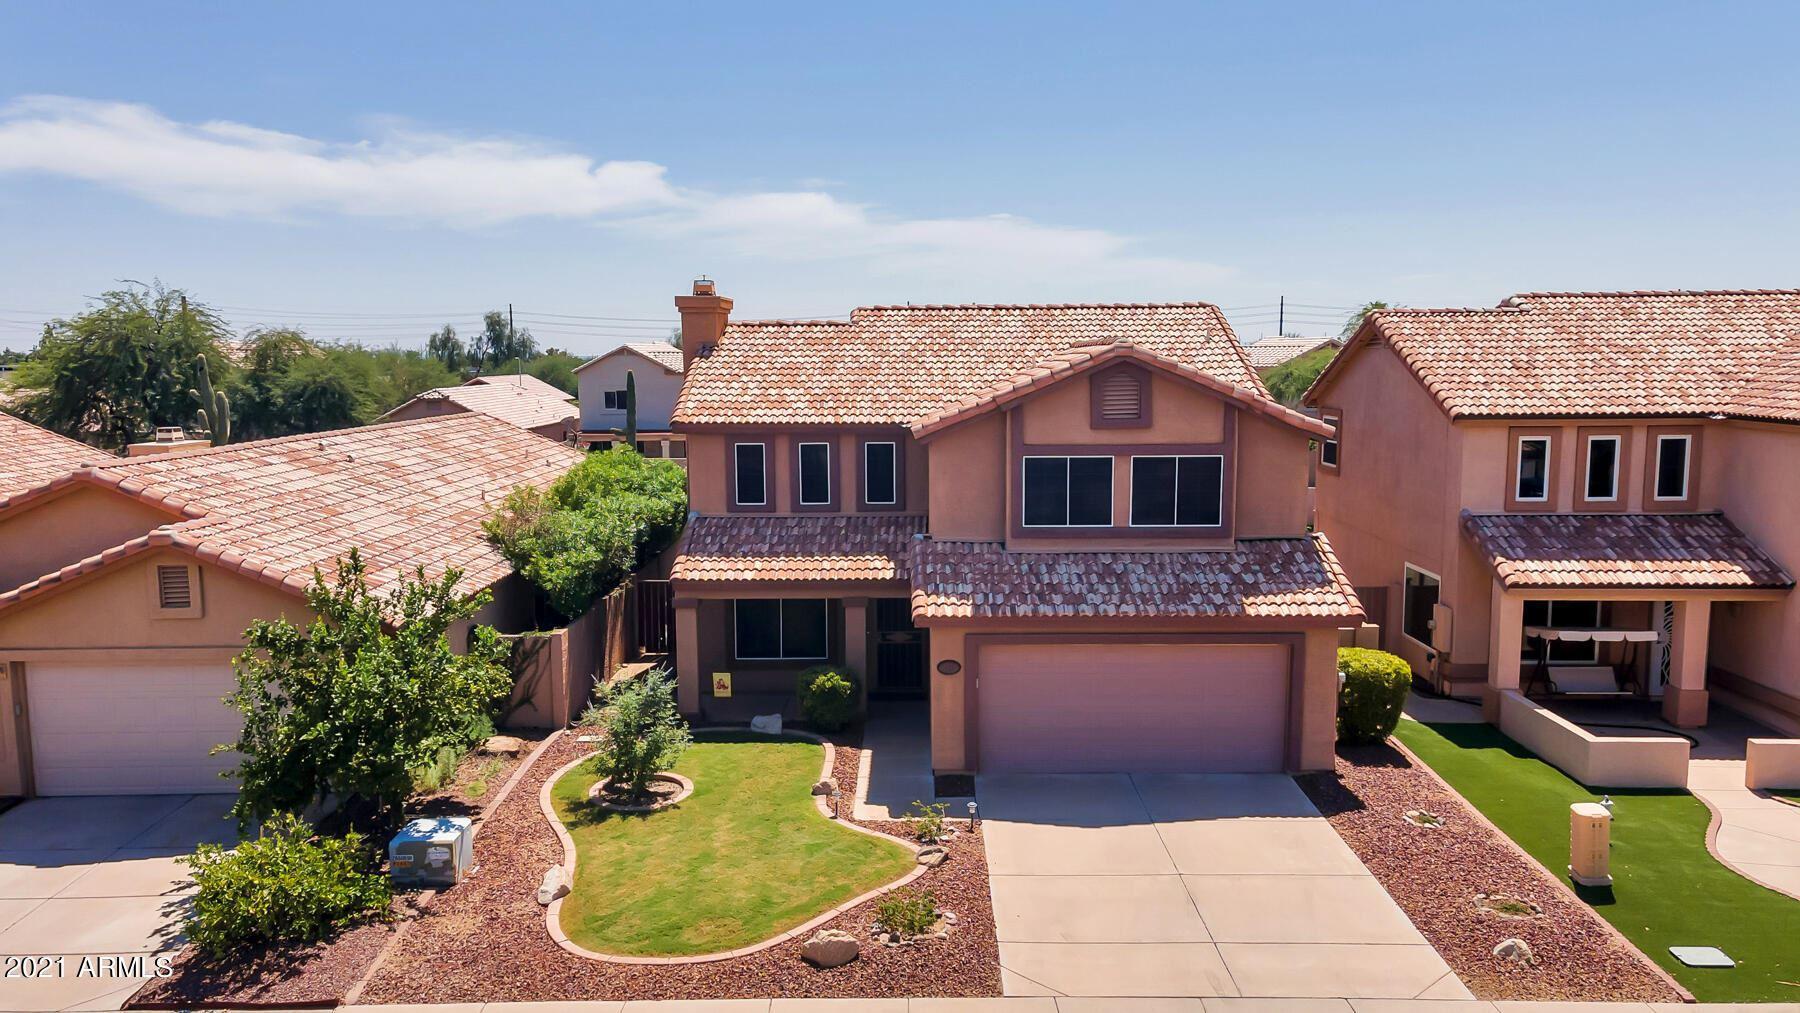 4245 E RAVEN Road, Phoenix, AZ 85044 - MLS#: 6293558